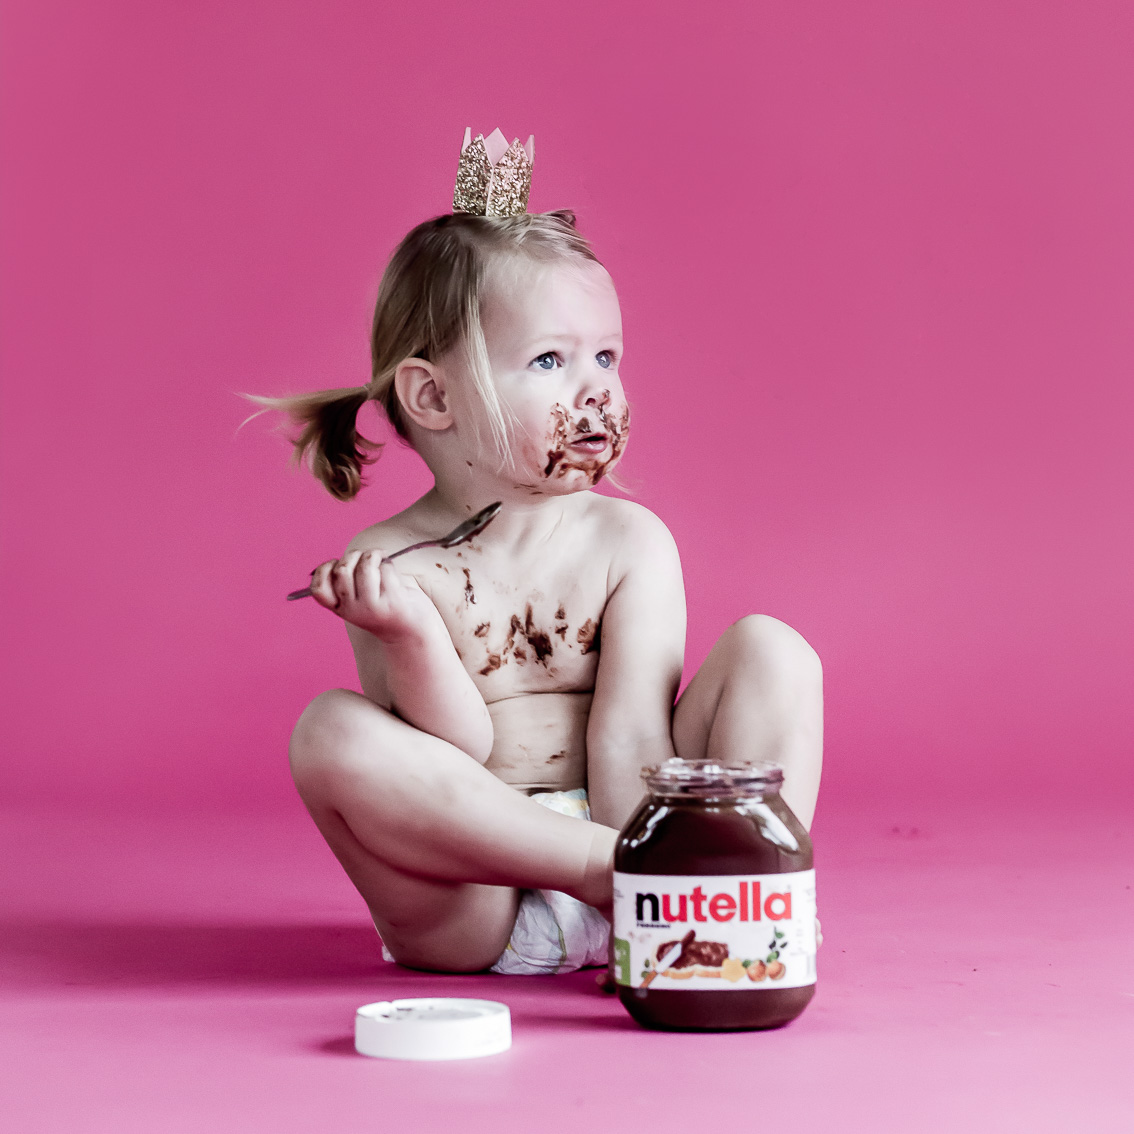 Suus Coolen Kinderfotografie Choco Babbie